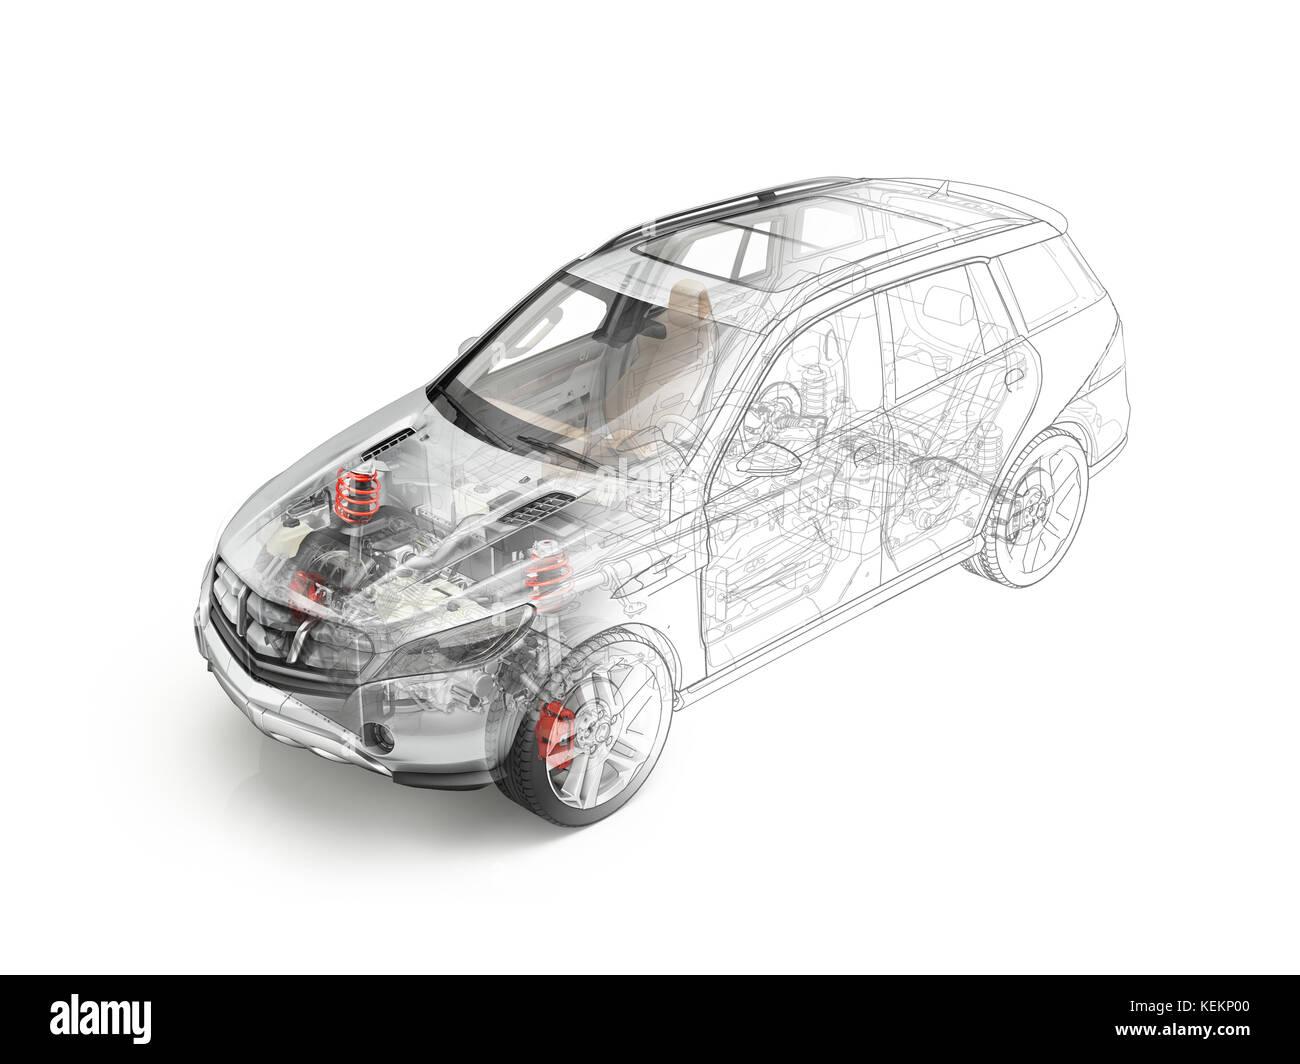 Suv-Fahrzeug technische Cutaway, Querschnitt Stockfoto, Bild ...